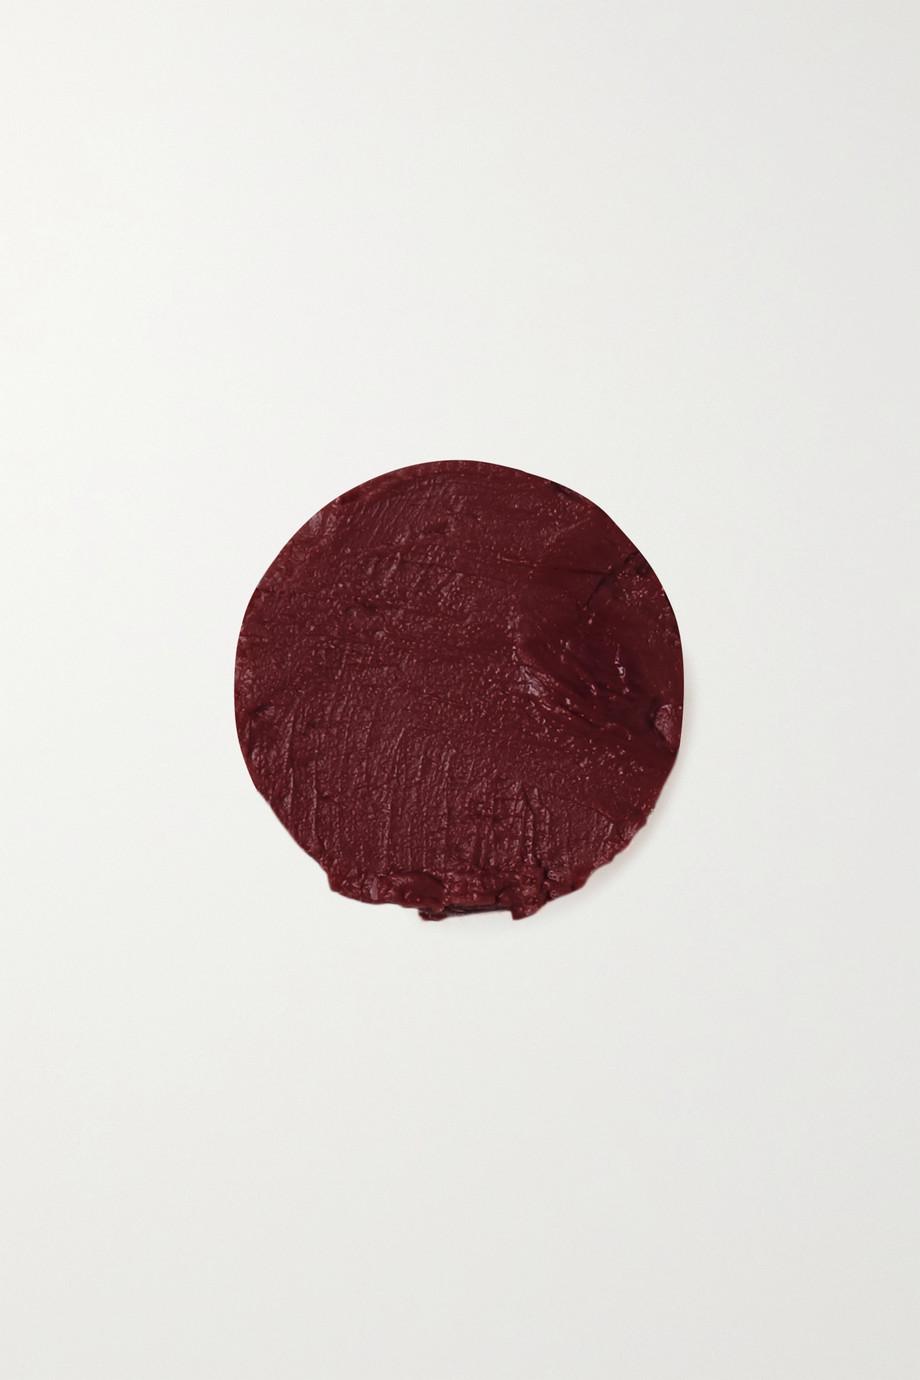 Kevyn Aucoin Unforgettable Lipstick - Bloodroses Noir